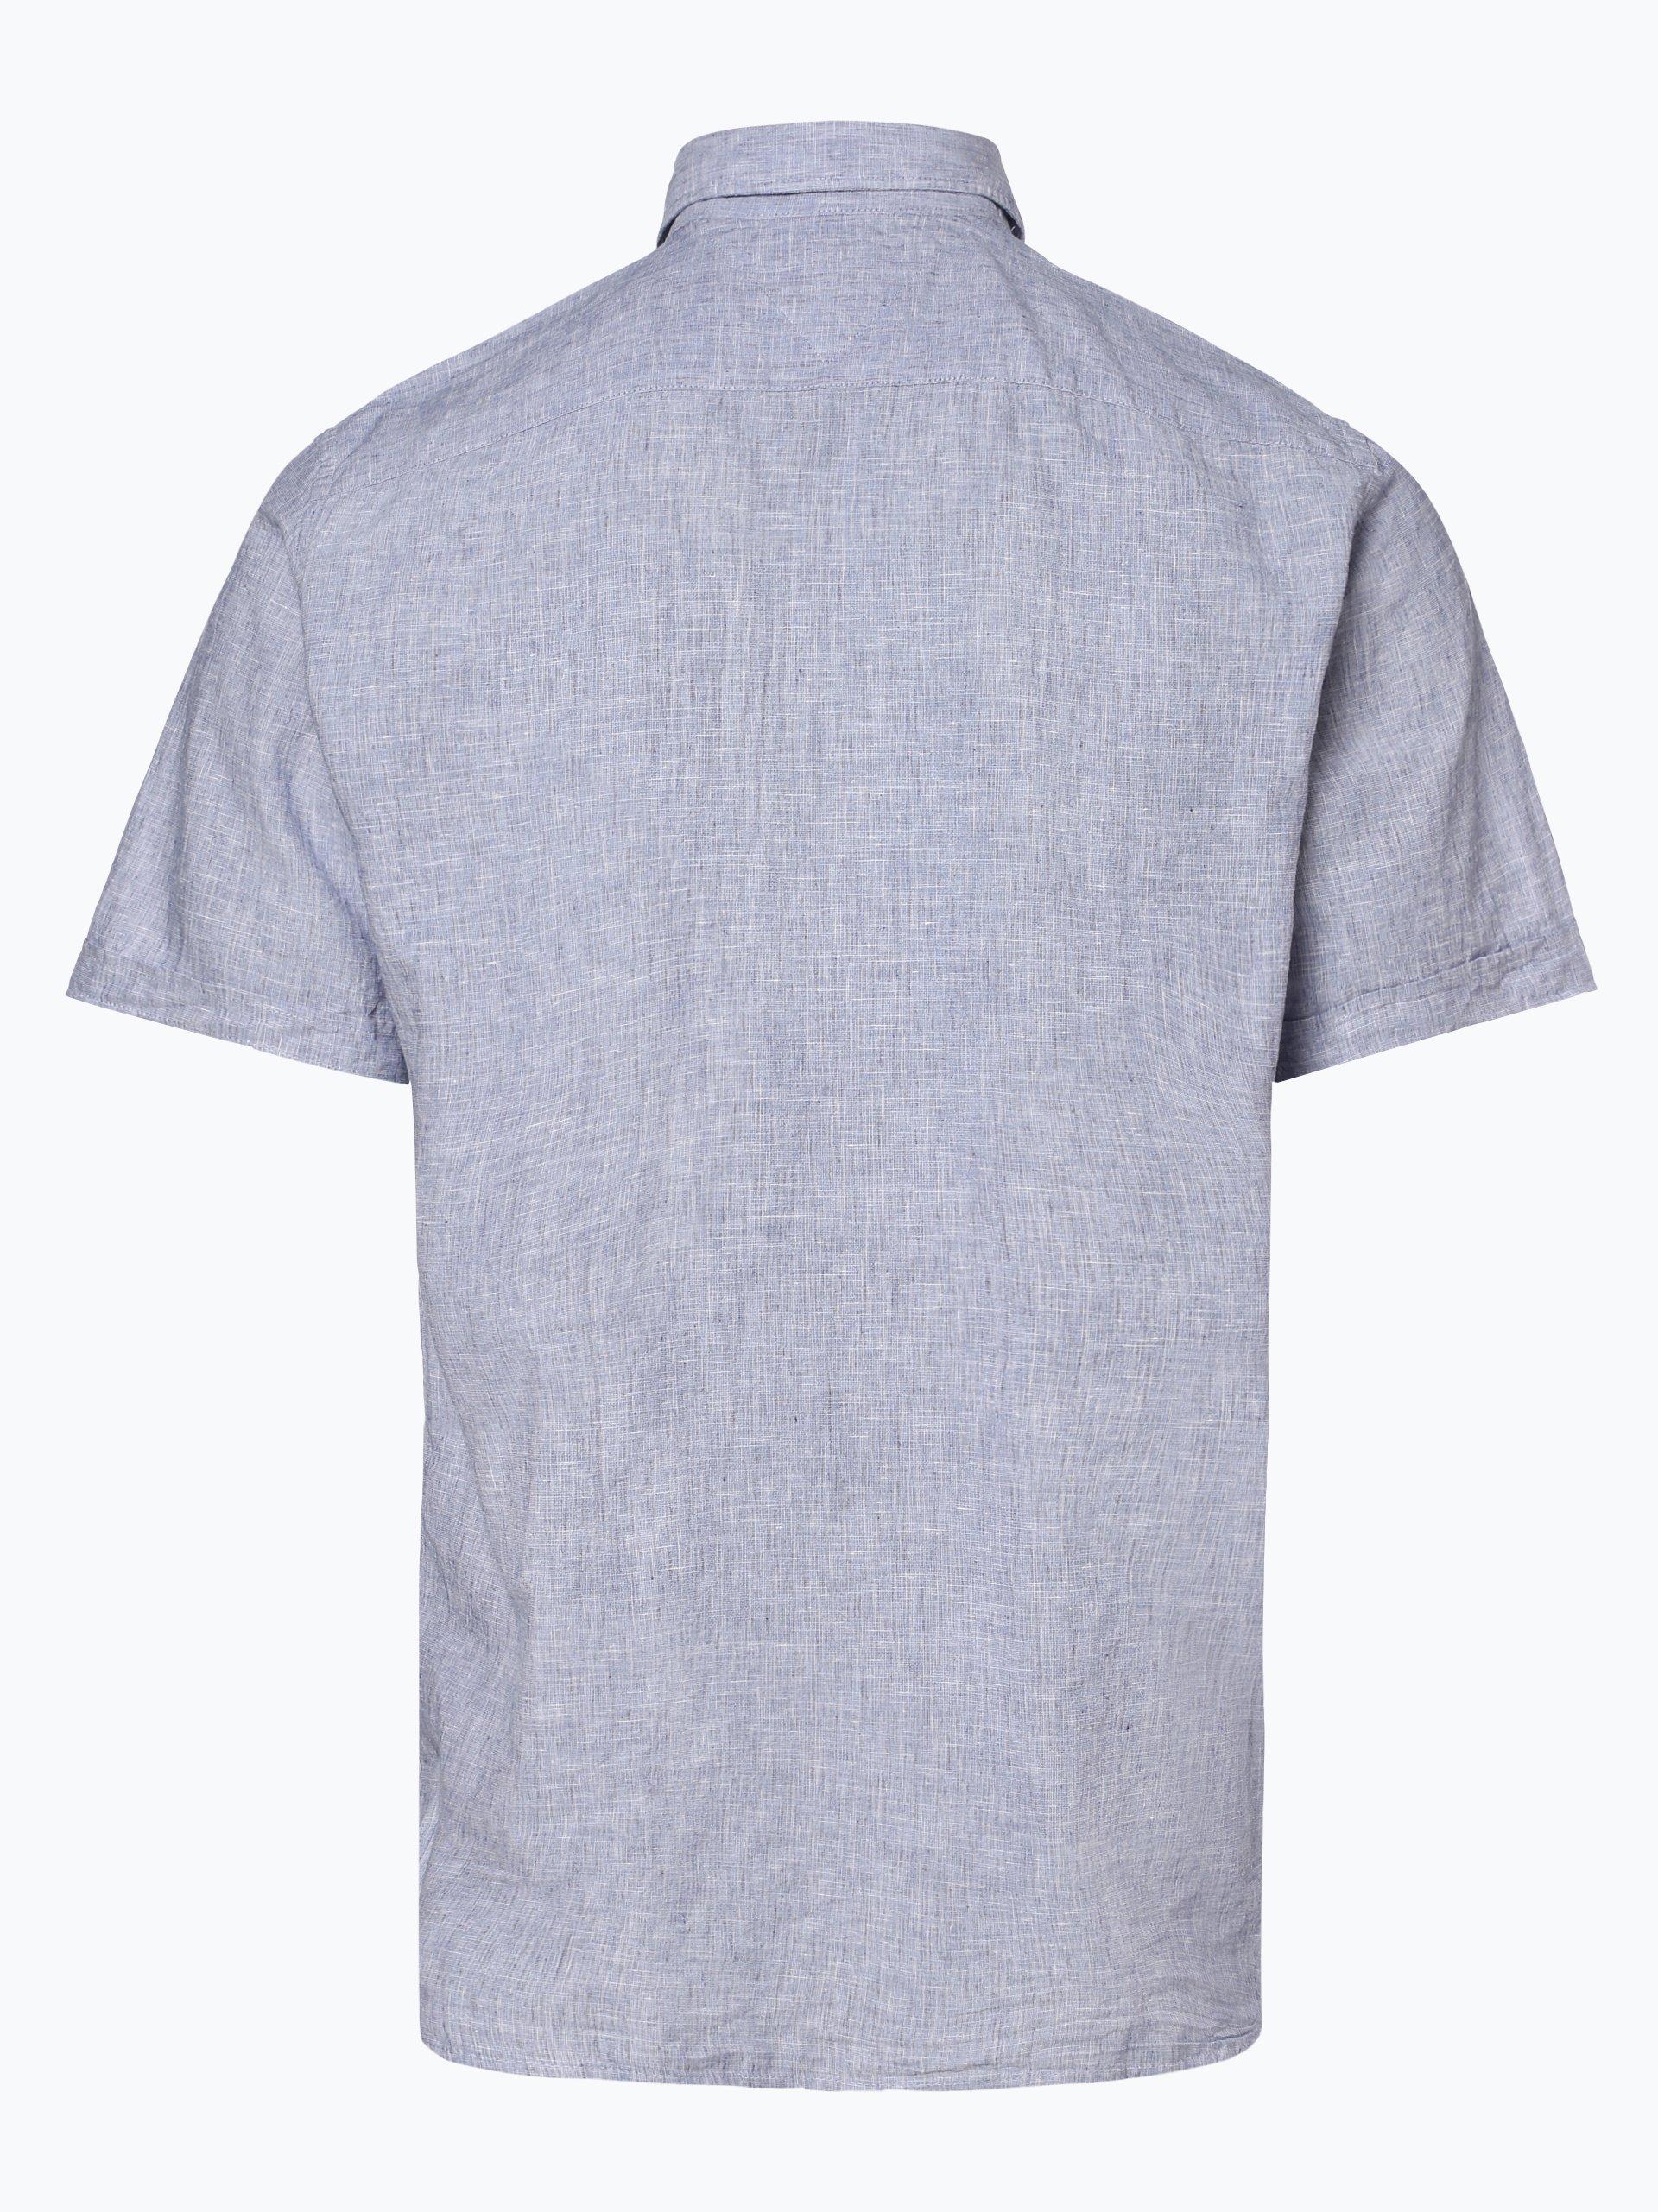 Tommy Hilfiger Męska koszula z dodatkiem lnu